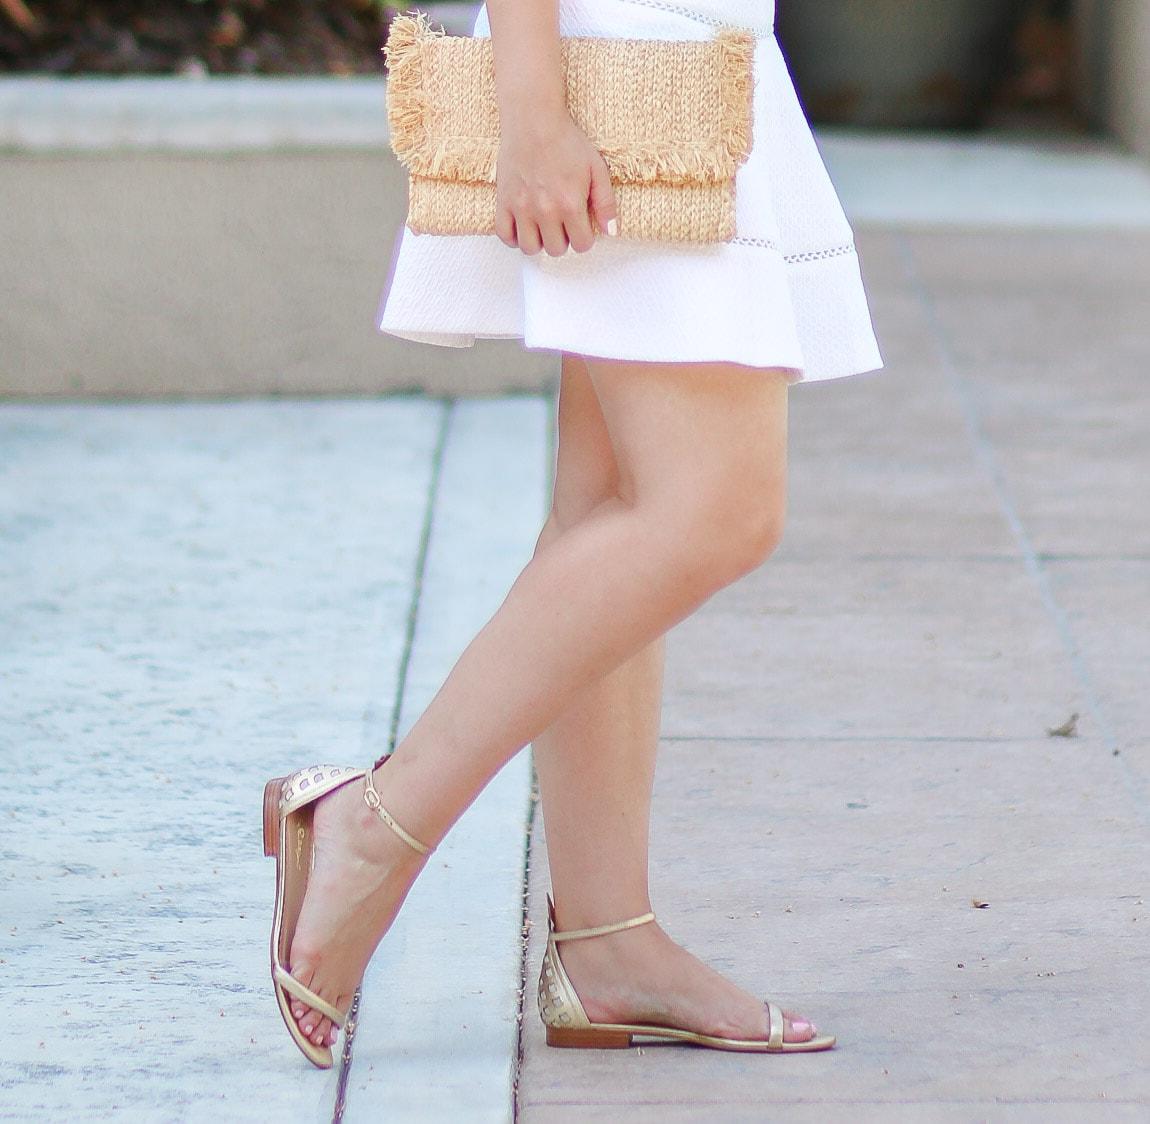 lilly-pulitzer-arya-gold-pineapple-sandals-quay-my-girl-sunglasses-banana-republic-white-skirt-ashley-brooke-3111-2